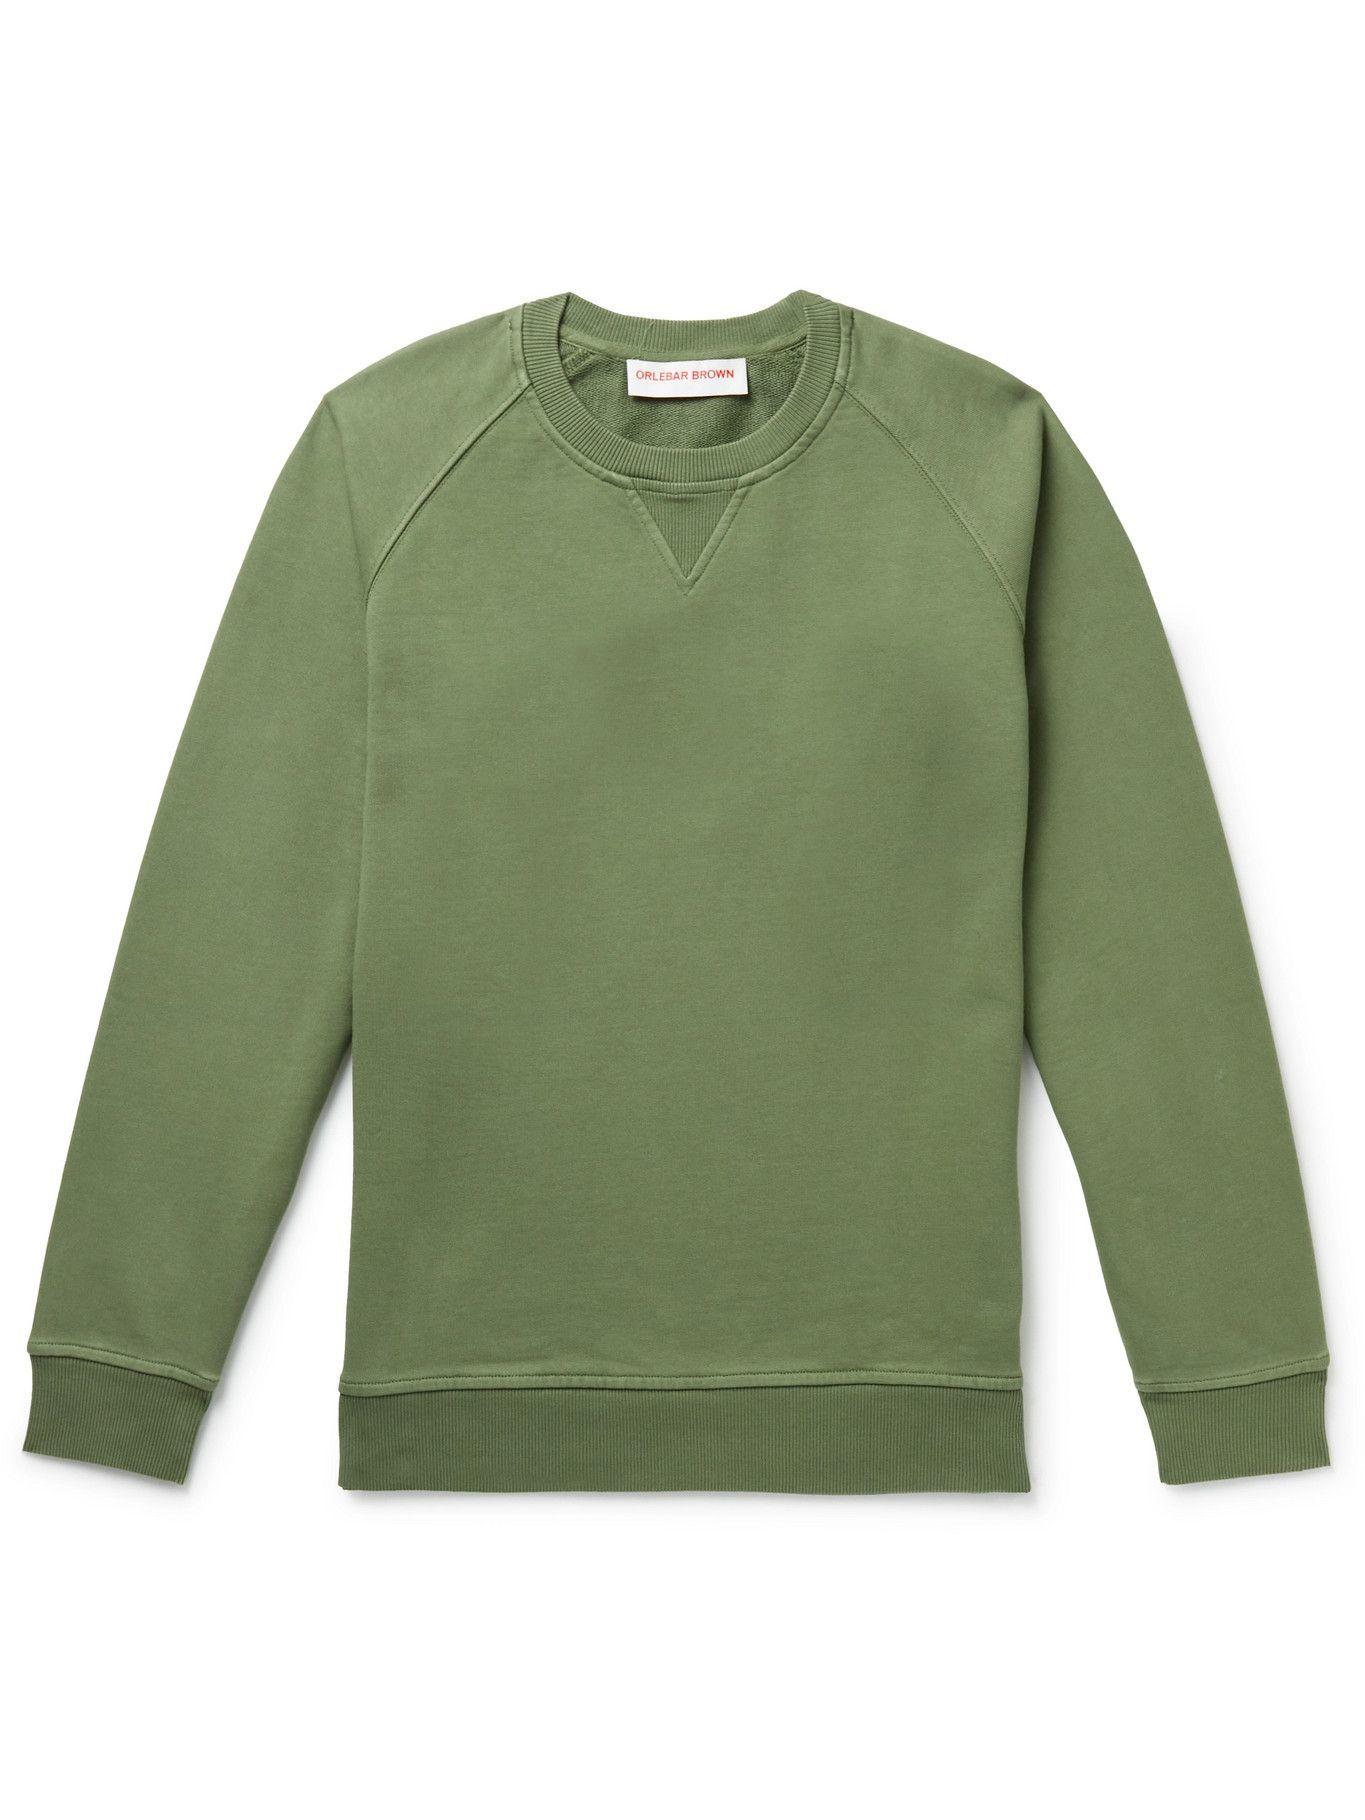 Photo: Orlebar Brown - Bingham Cotton-Jersey Sweatshirt - Green